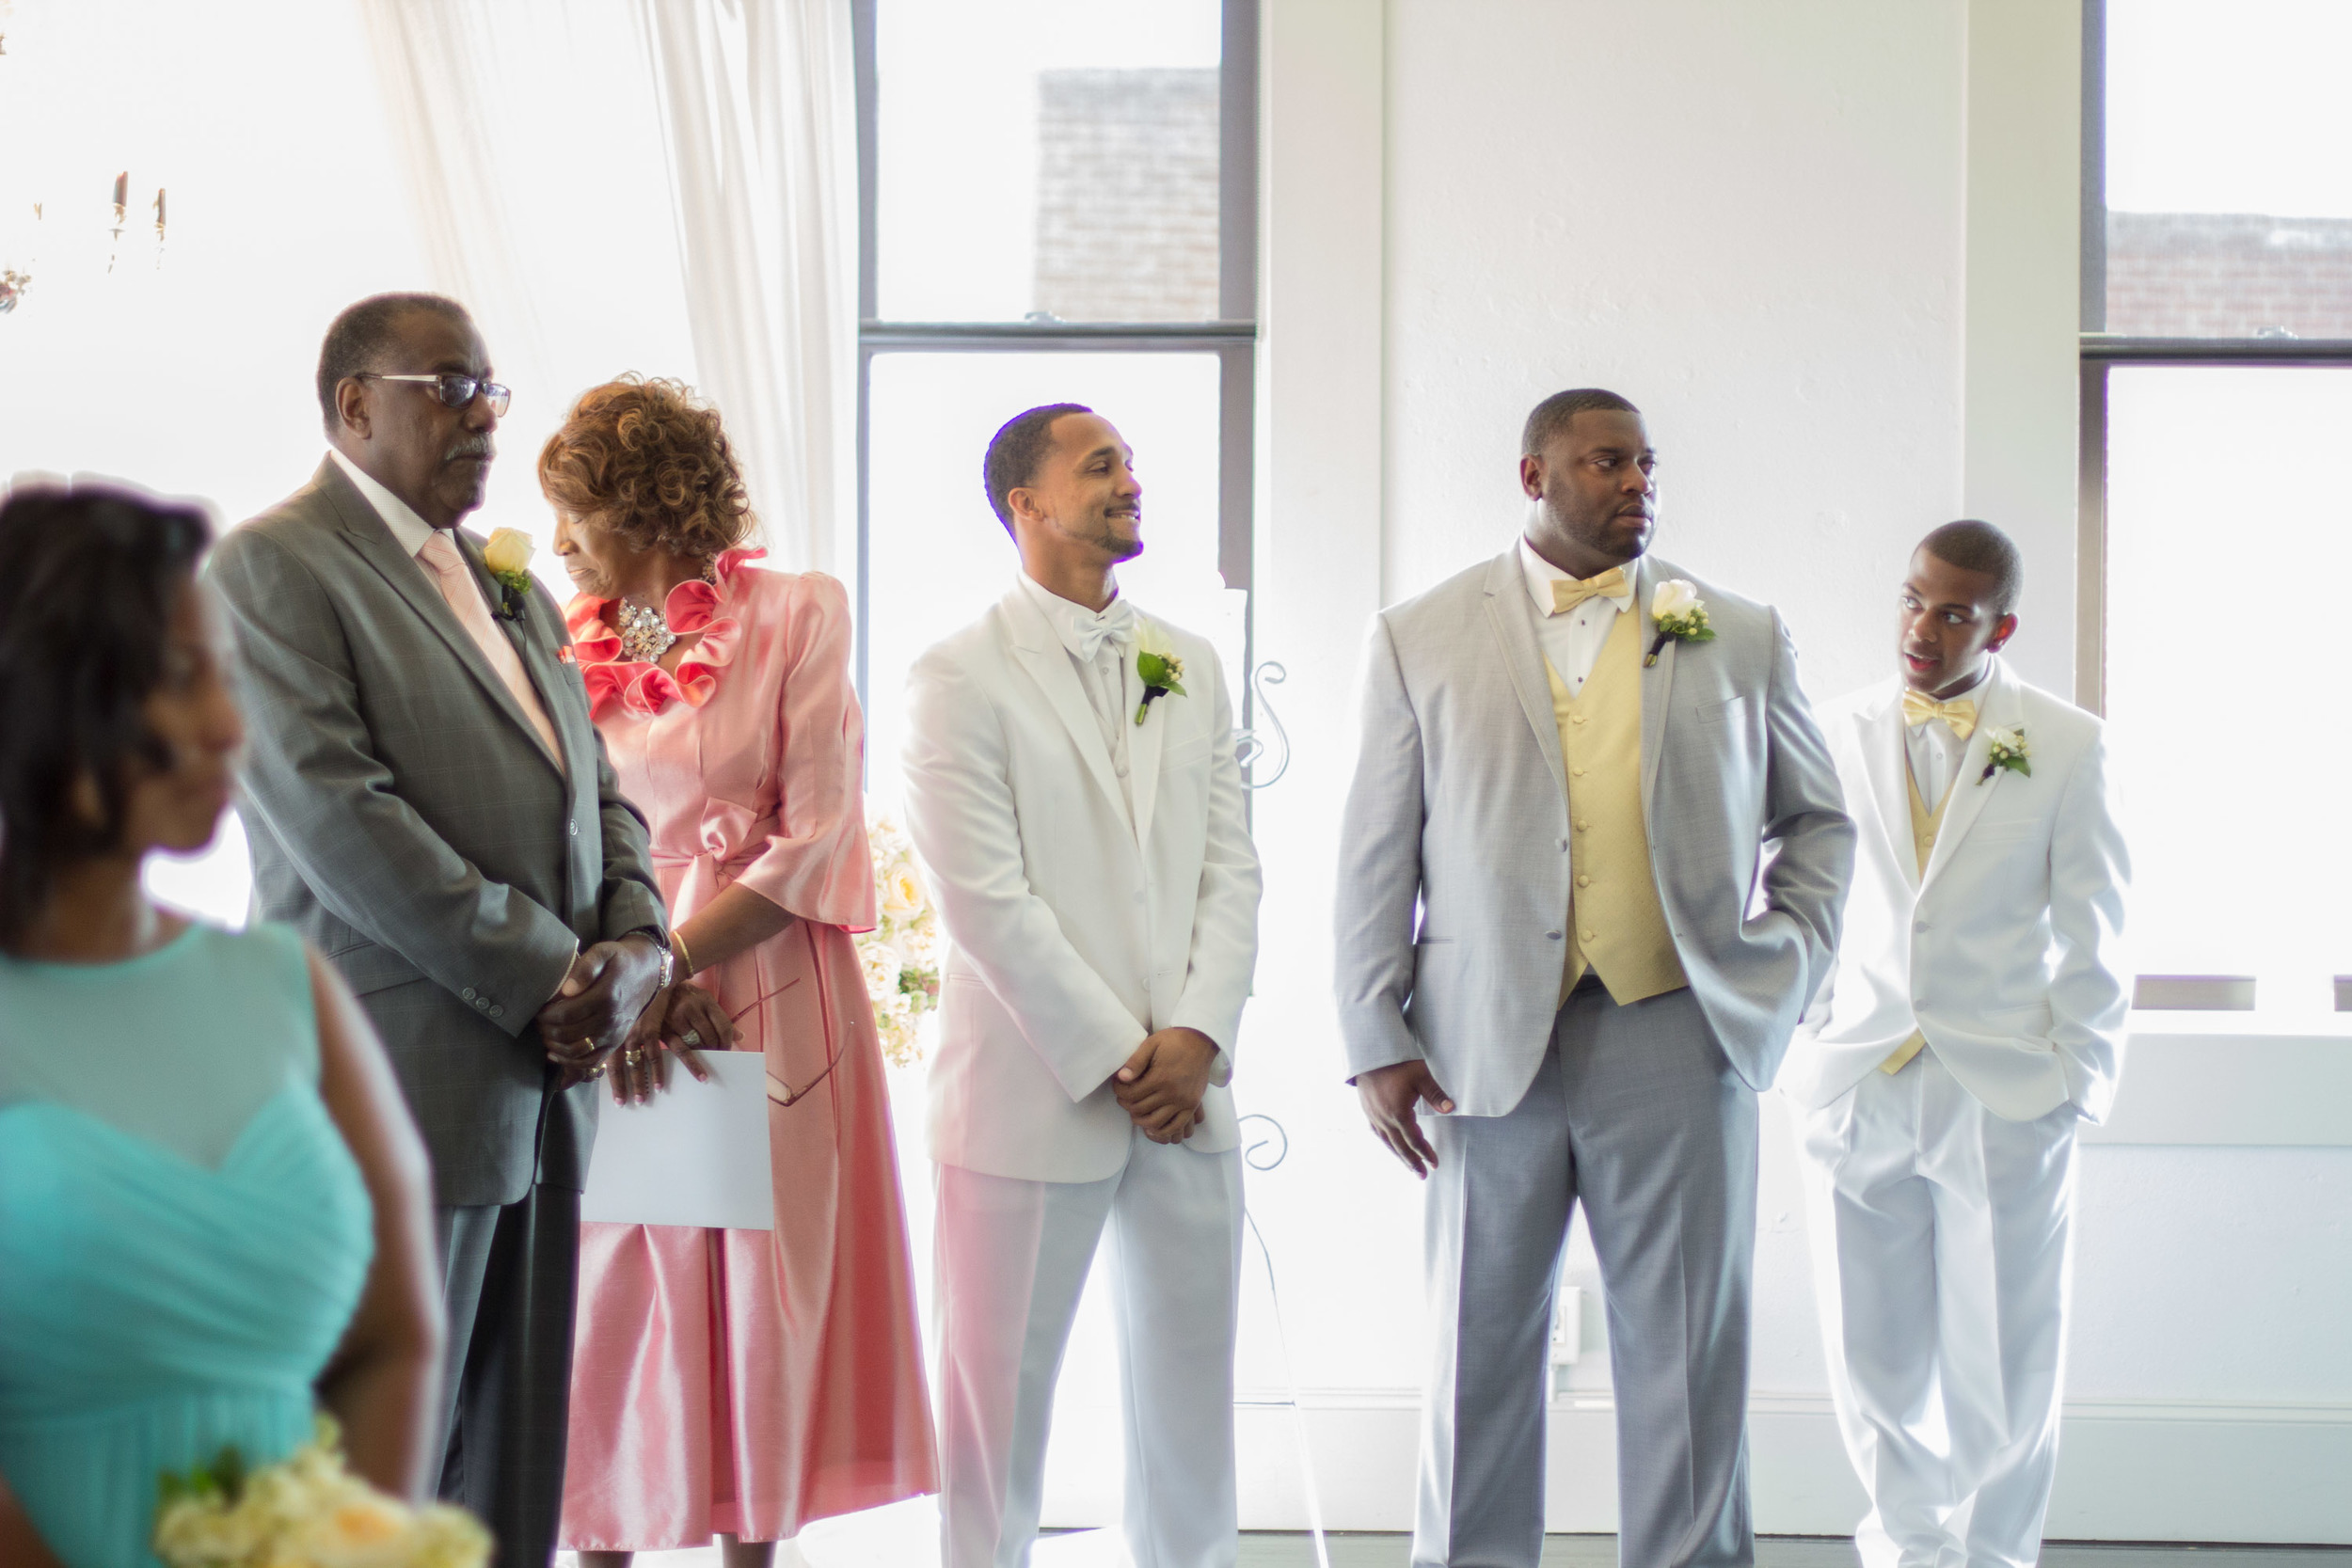 martinsborough-wedding-greenville-nc-bryant-tyson